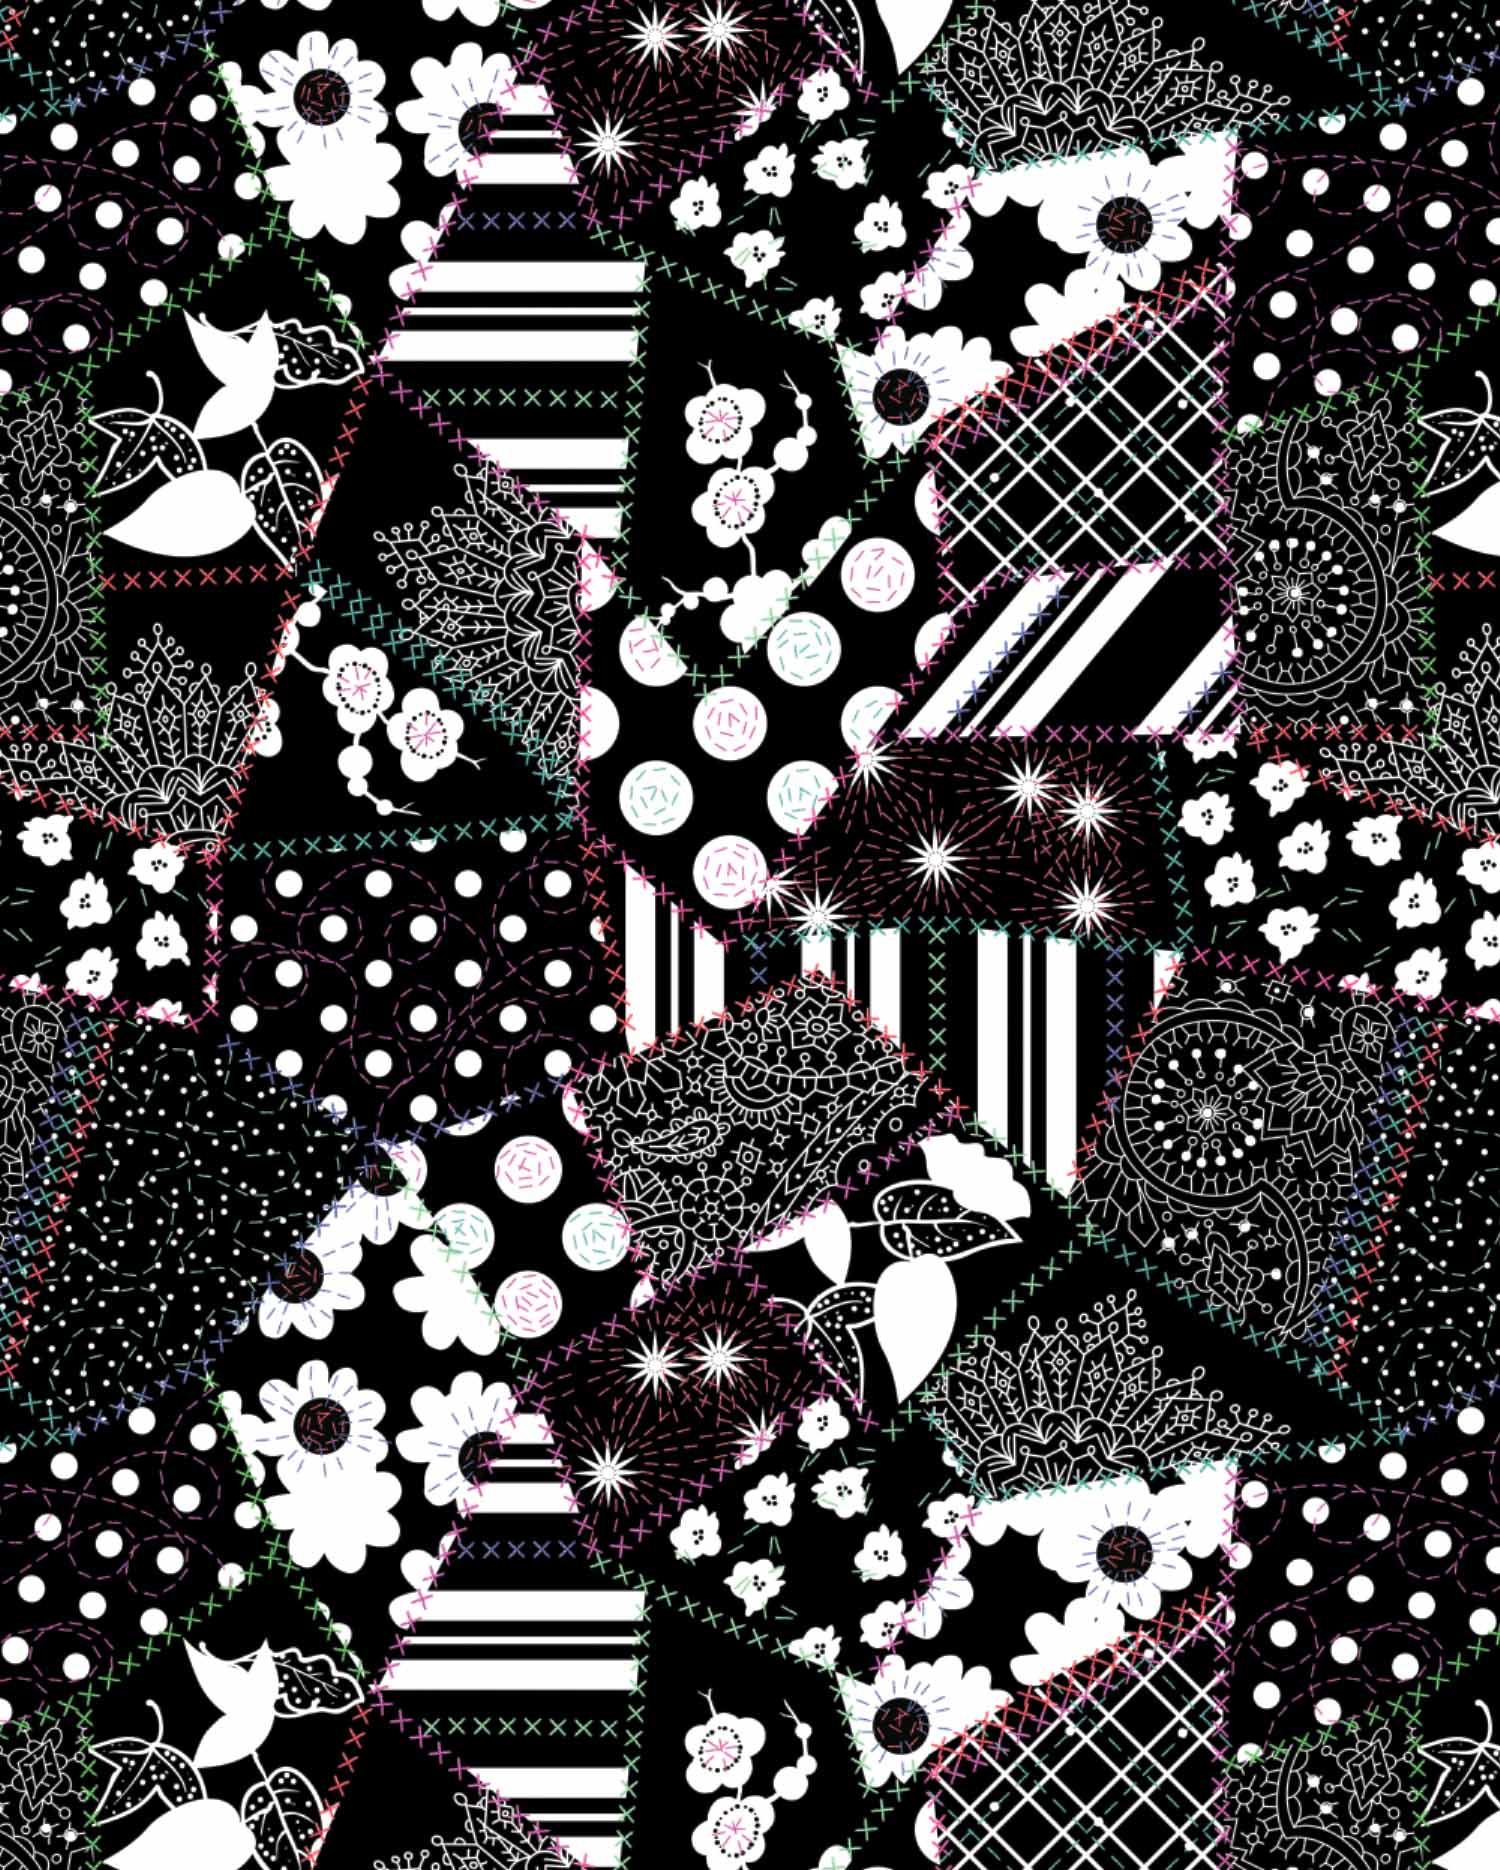 Black Crazy Quilt pattern